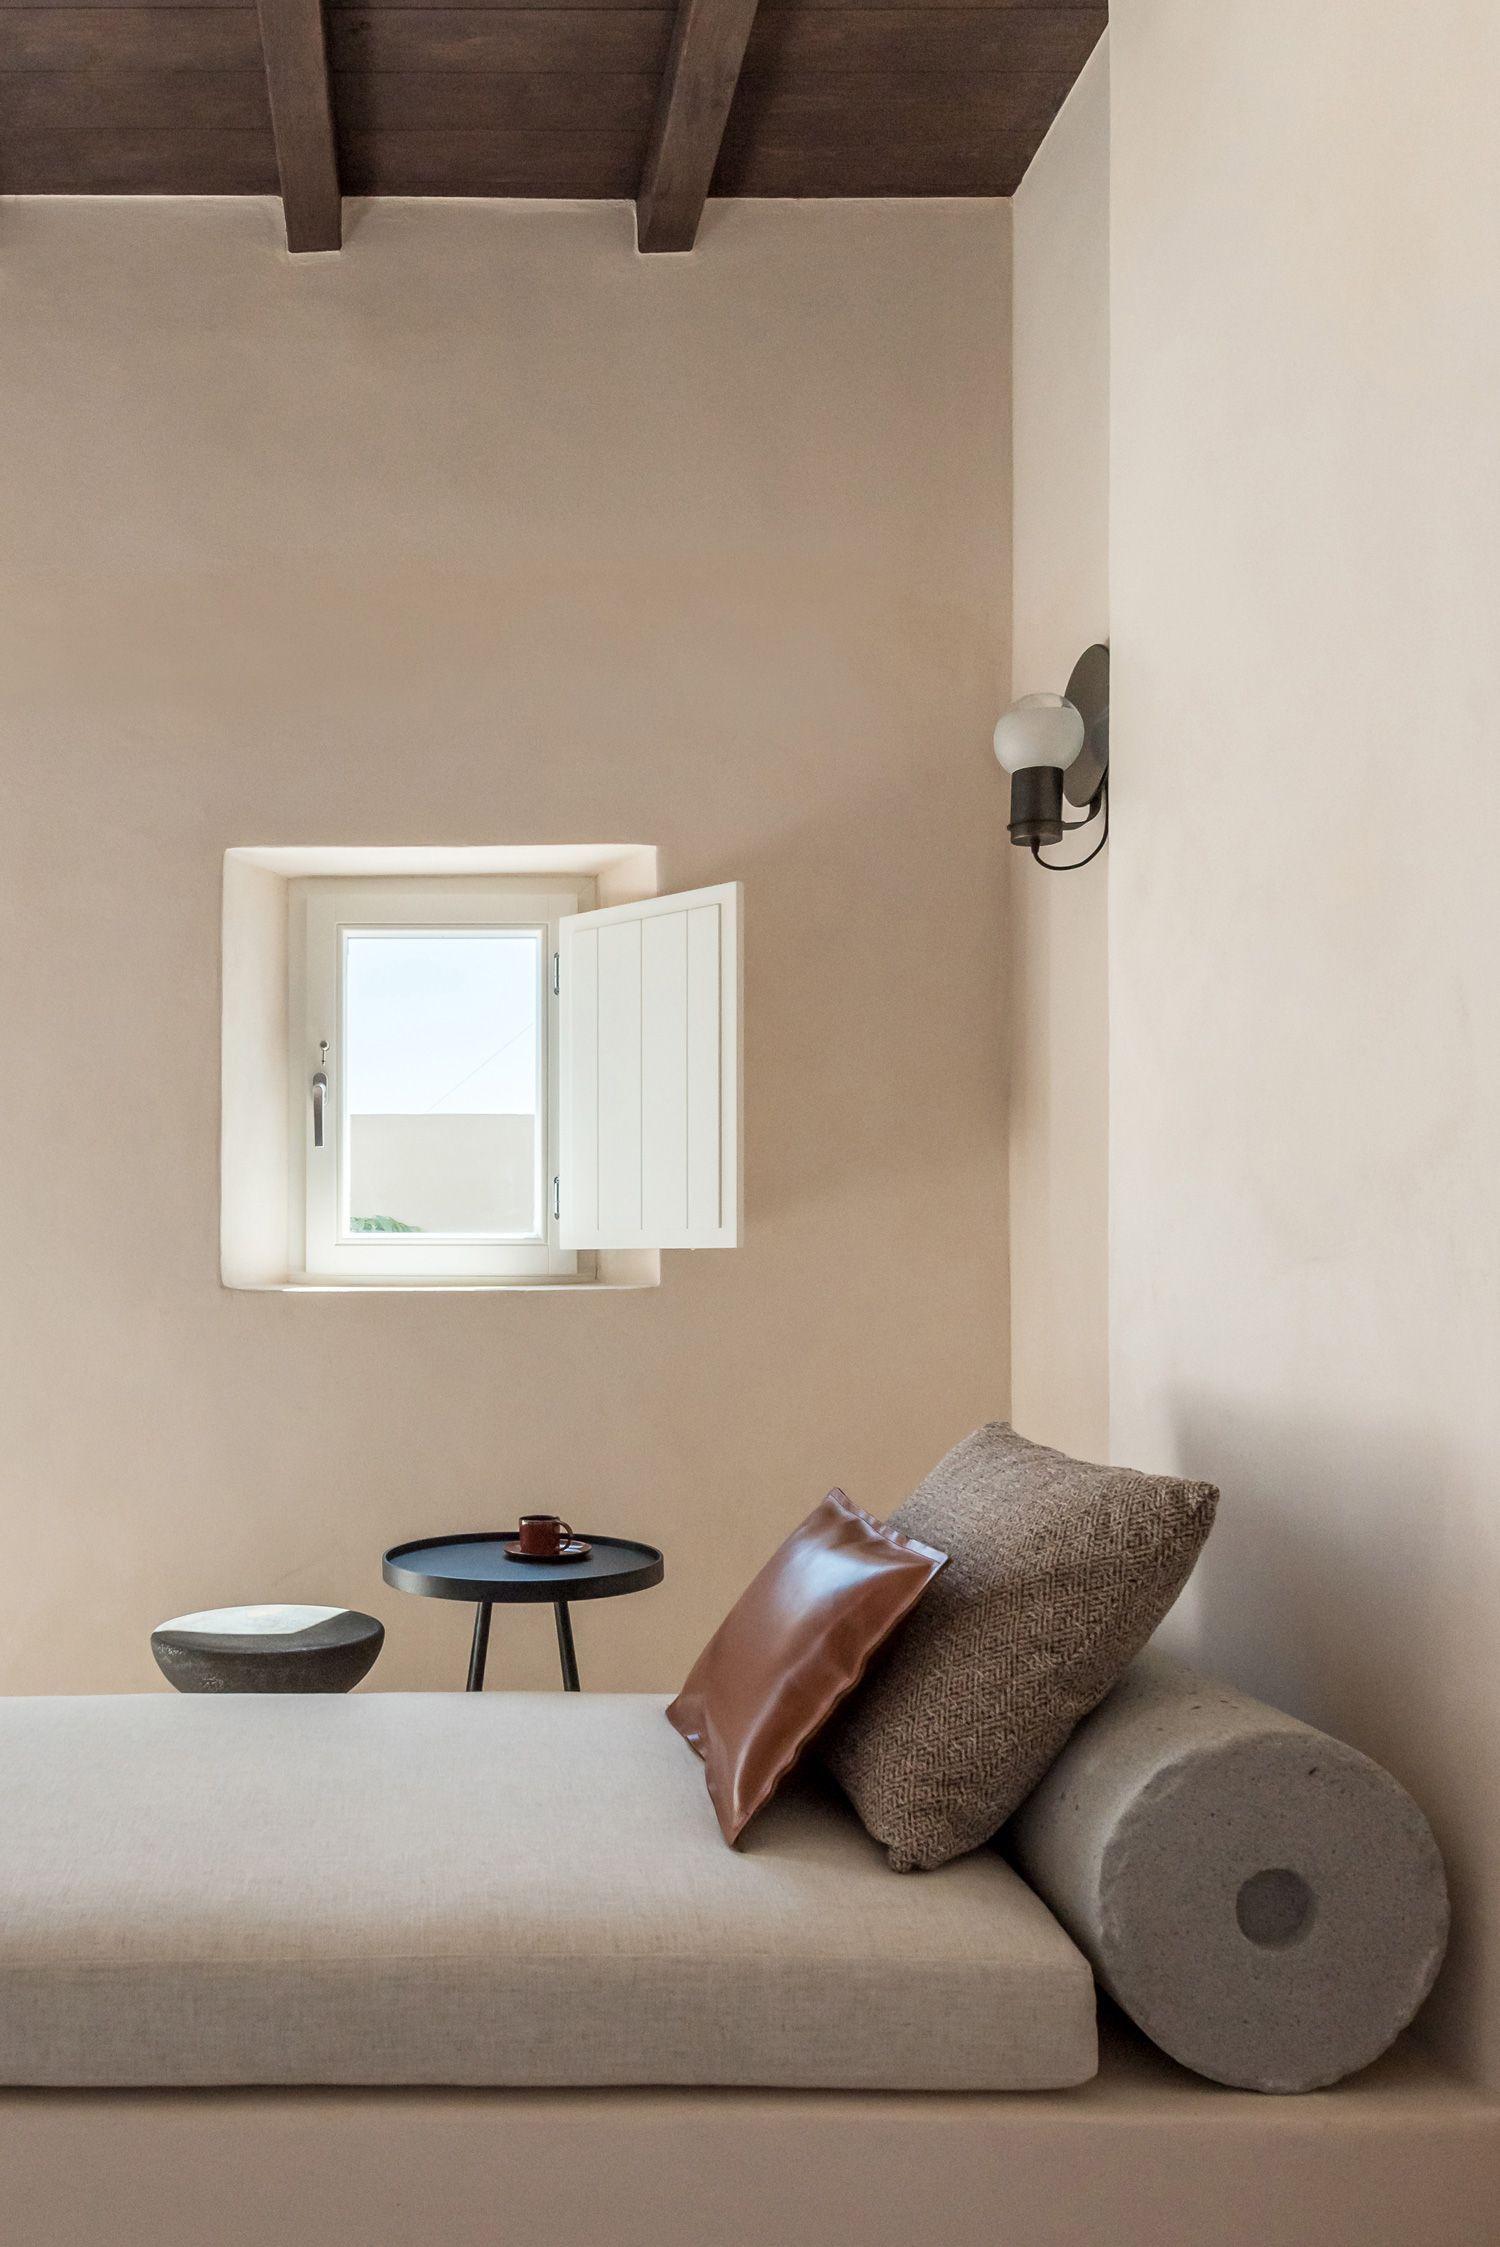 Minimalist Hotel Room: Dream With Us: Imagine The Perfect Hotel Room Design